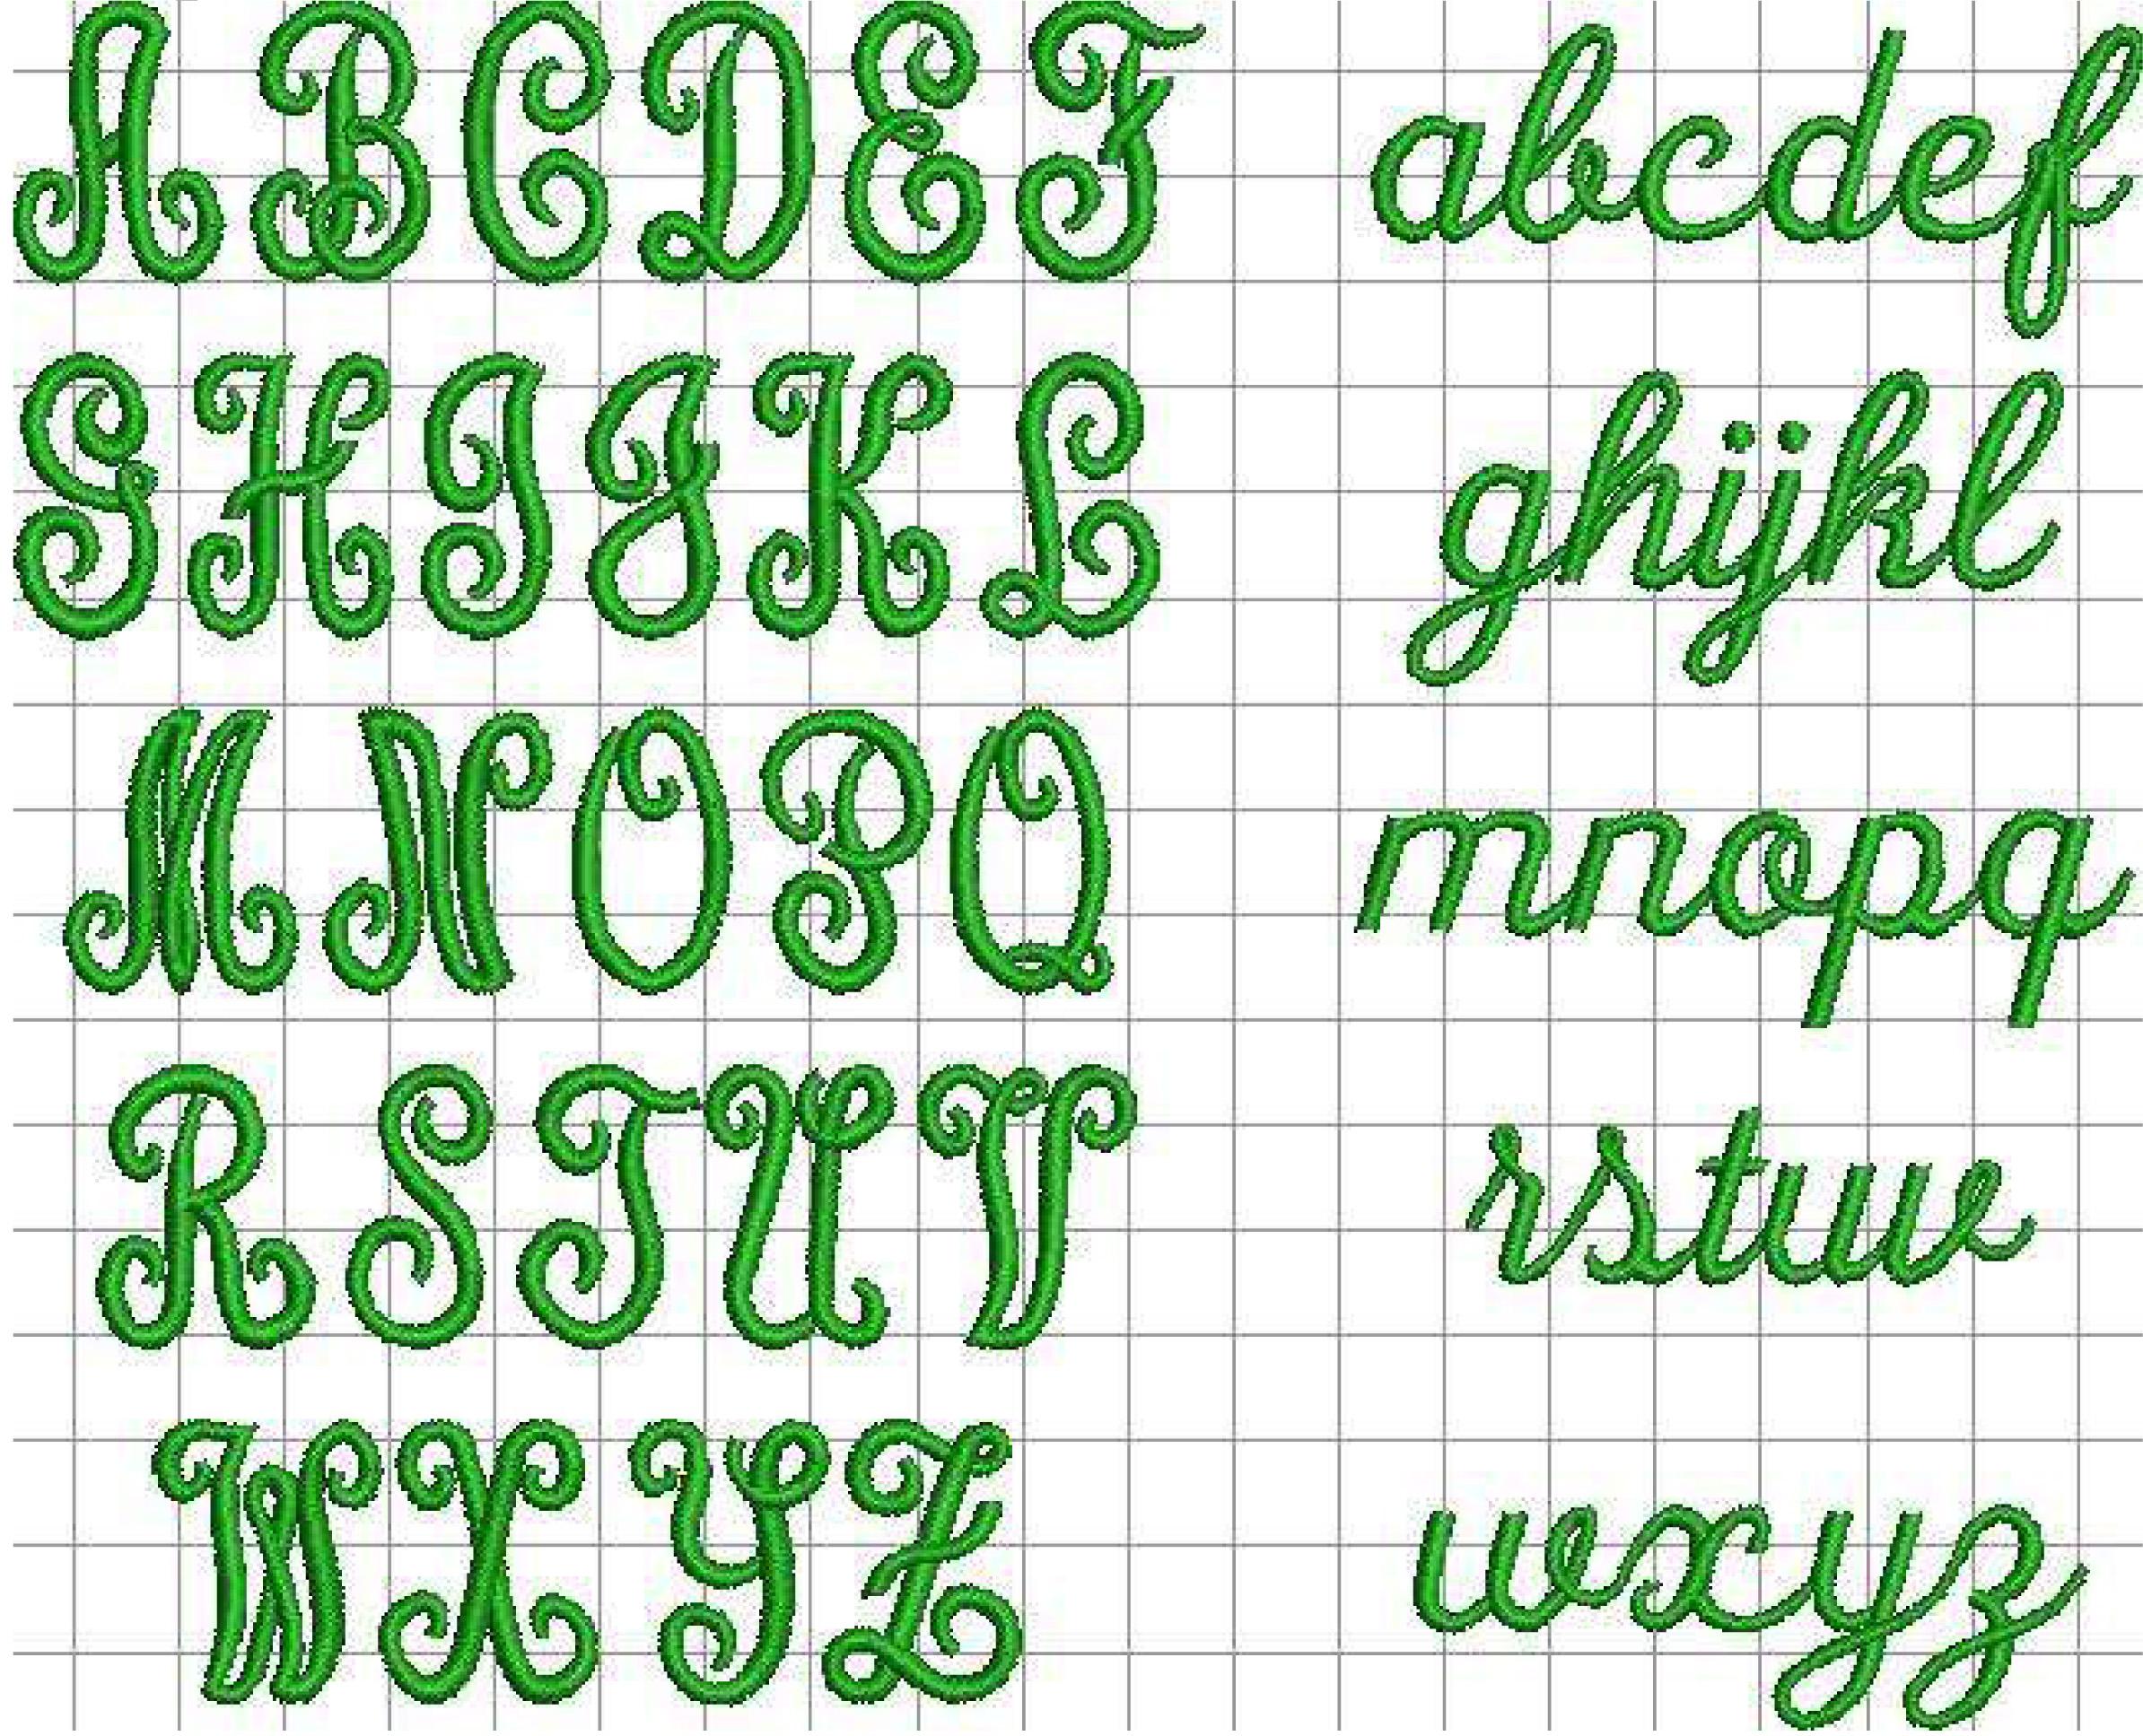 upright-script.jpg